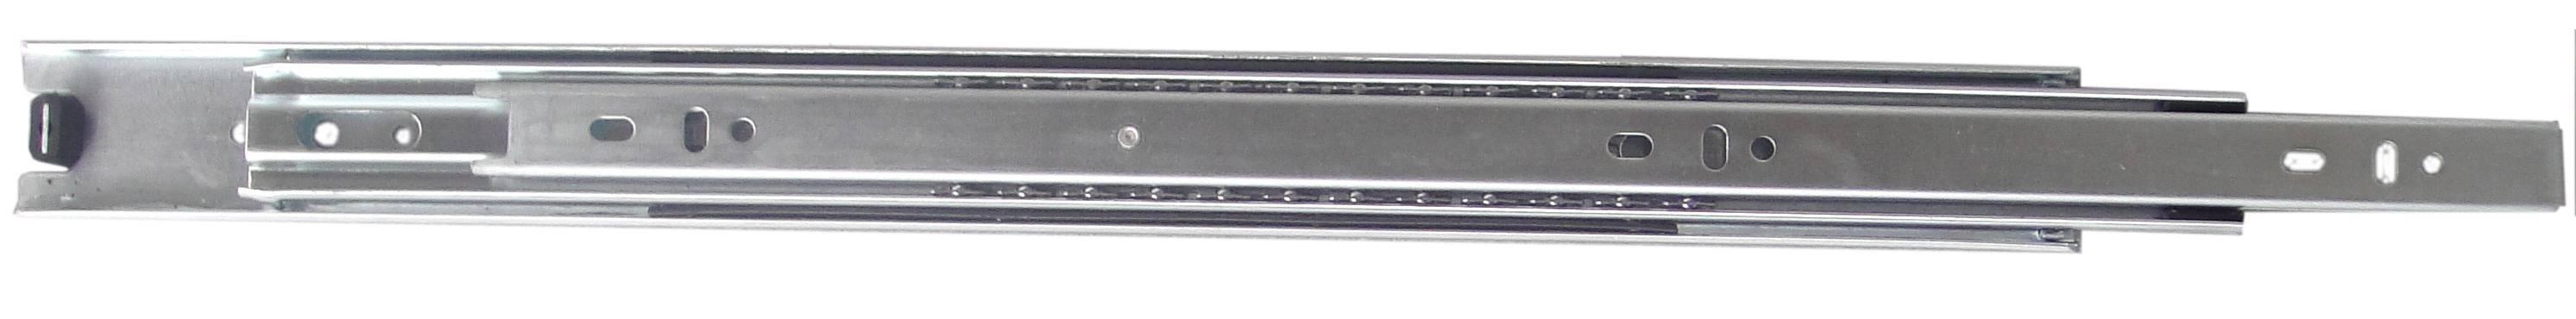 3508drawer slide